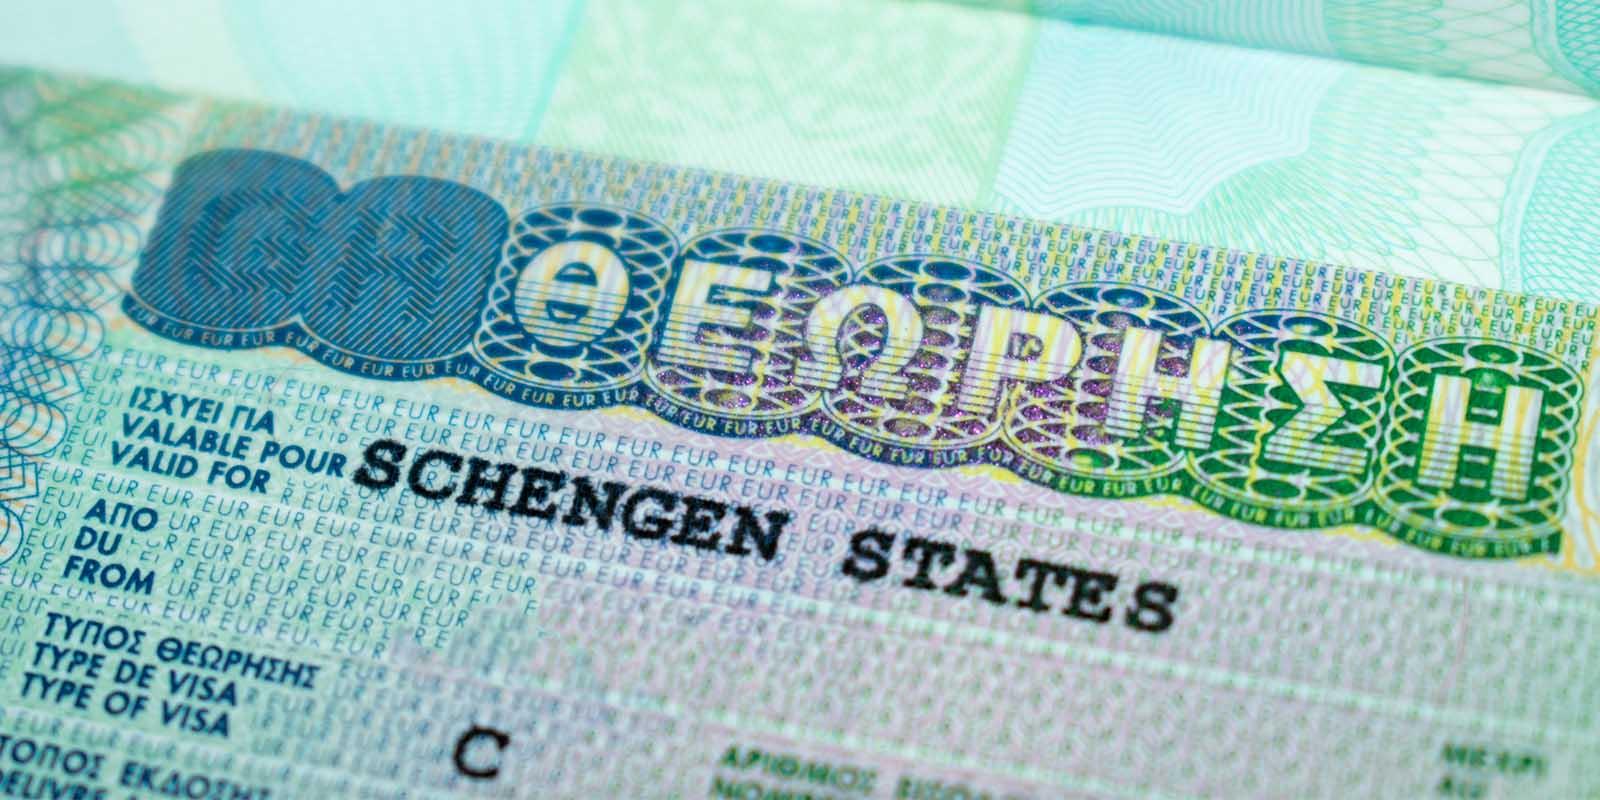 Schengen visa, greece citizenship by investment